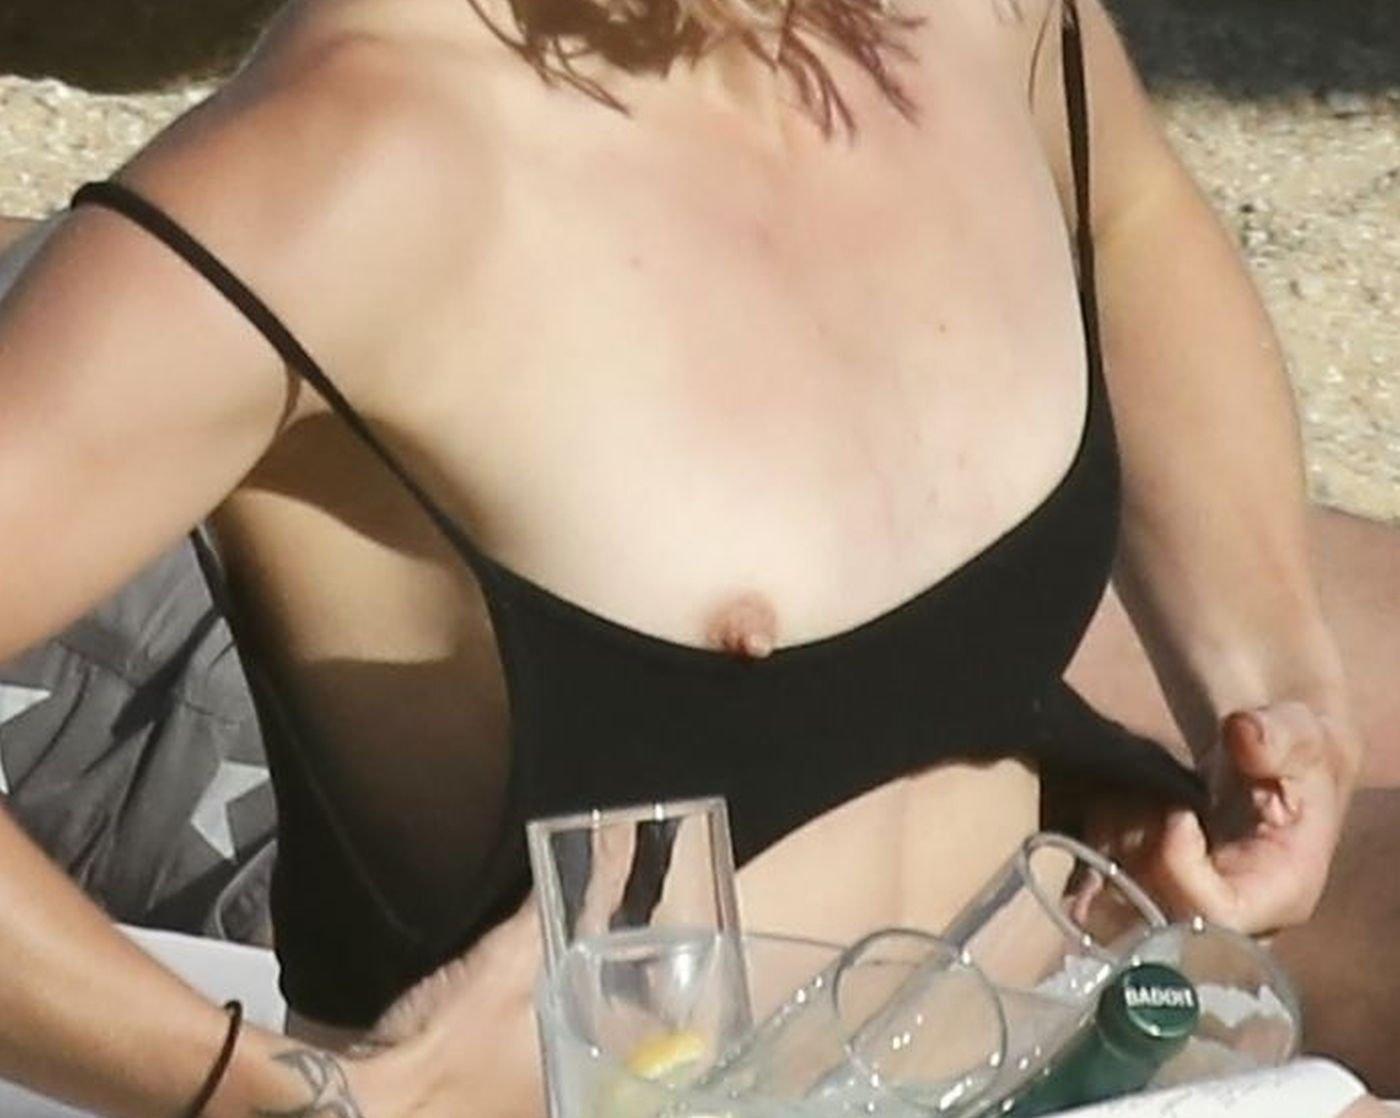 Stephanie-Pratt-Sexy-Topless-TheFappeningBlog.com-13.jpg